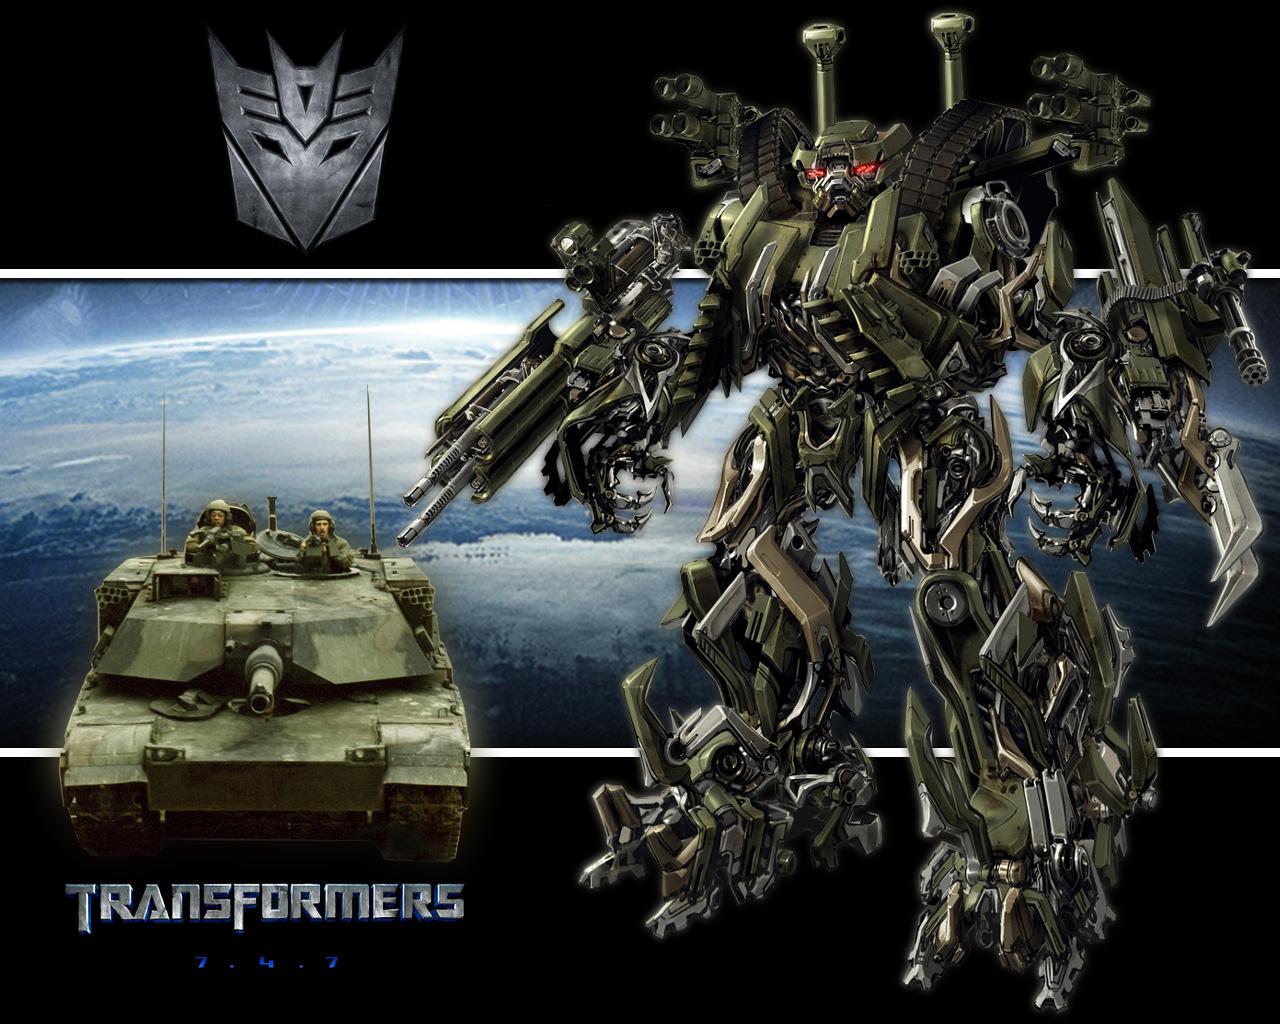 http://4.bp.blogspot.com/-ap-QJhKEJo8/Trf9vWOzkHI/AAAAAAAAARA/dvck-czXY1E/s1600/Brawl___Transformers_by_Rhanubis.jpg